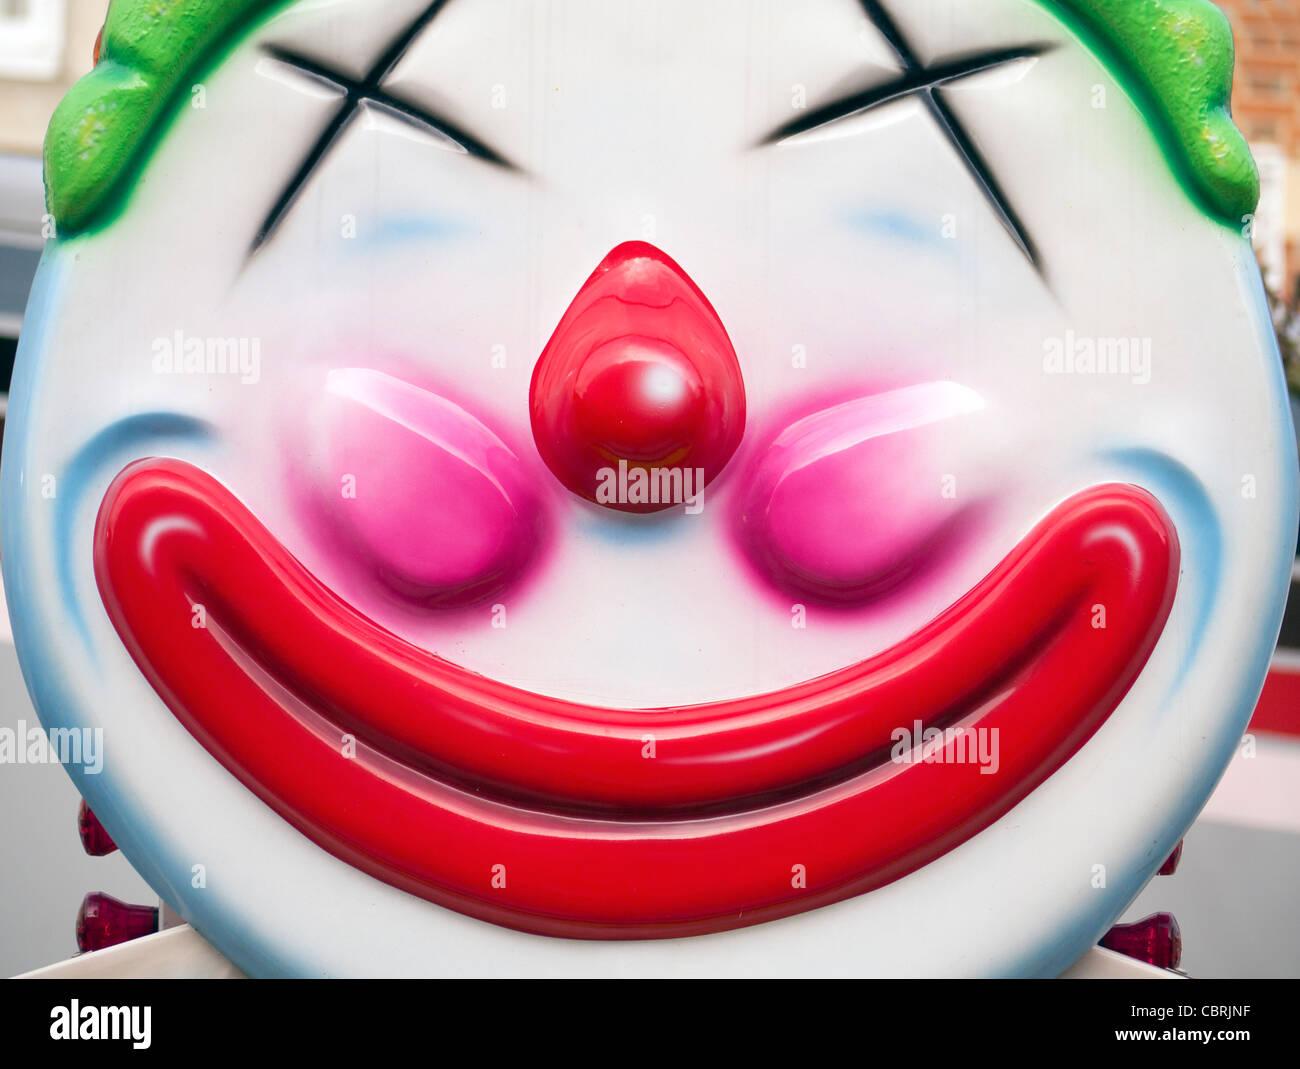 Kitsch clown - Abingdon Street Fair 2011 - Stock Image